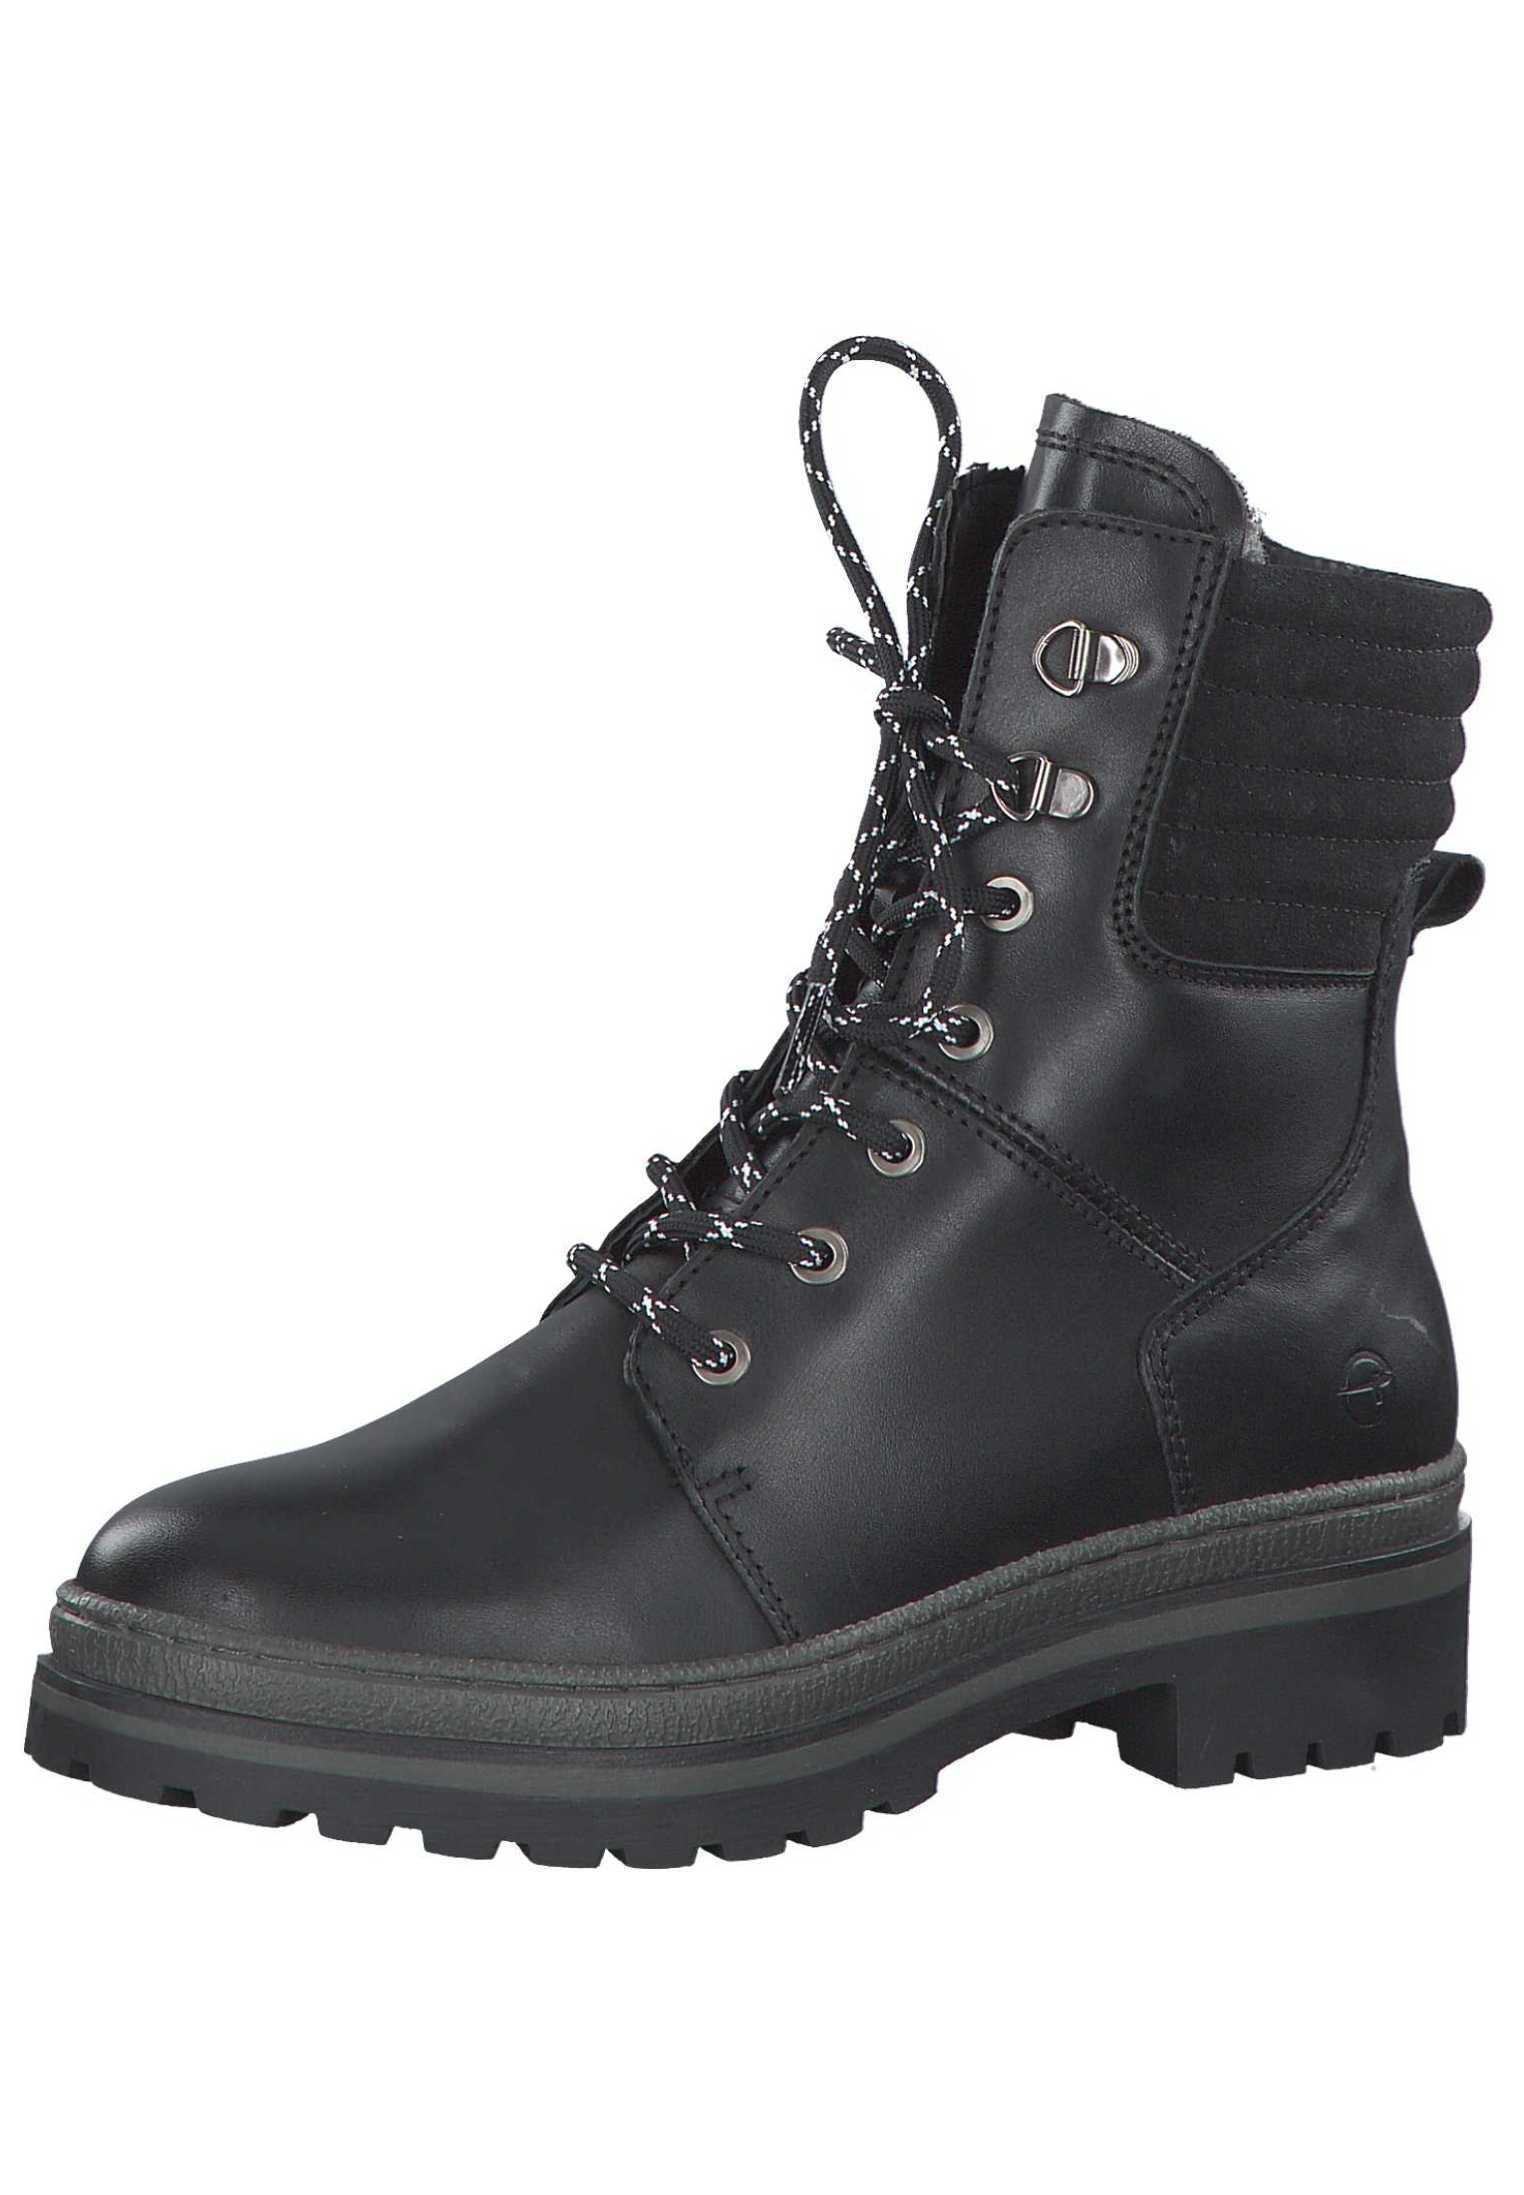 Tamaris Ankle Boot - Black 1/schwarz